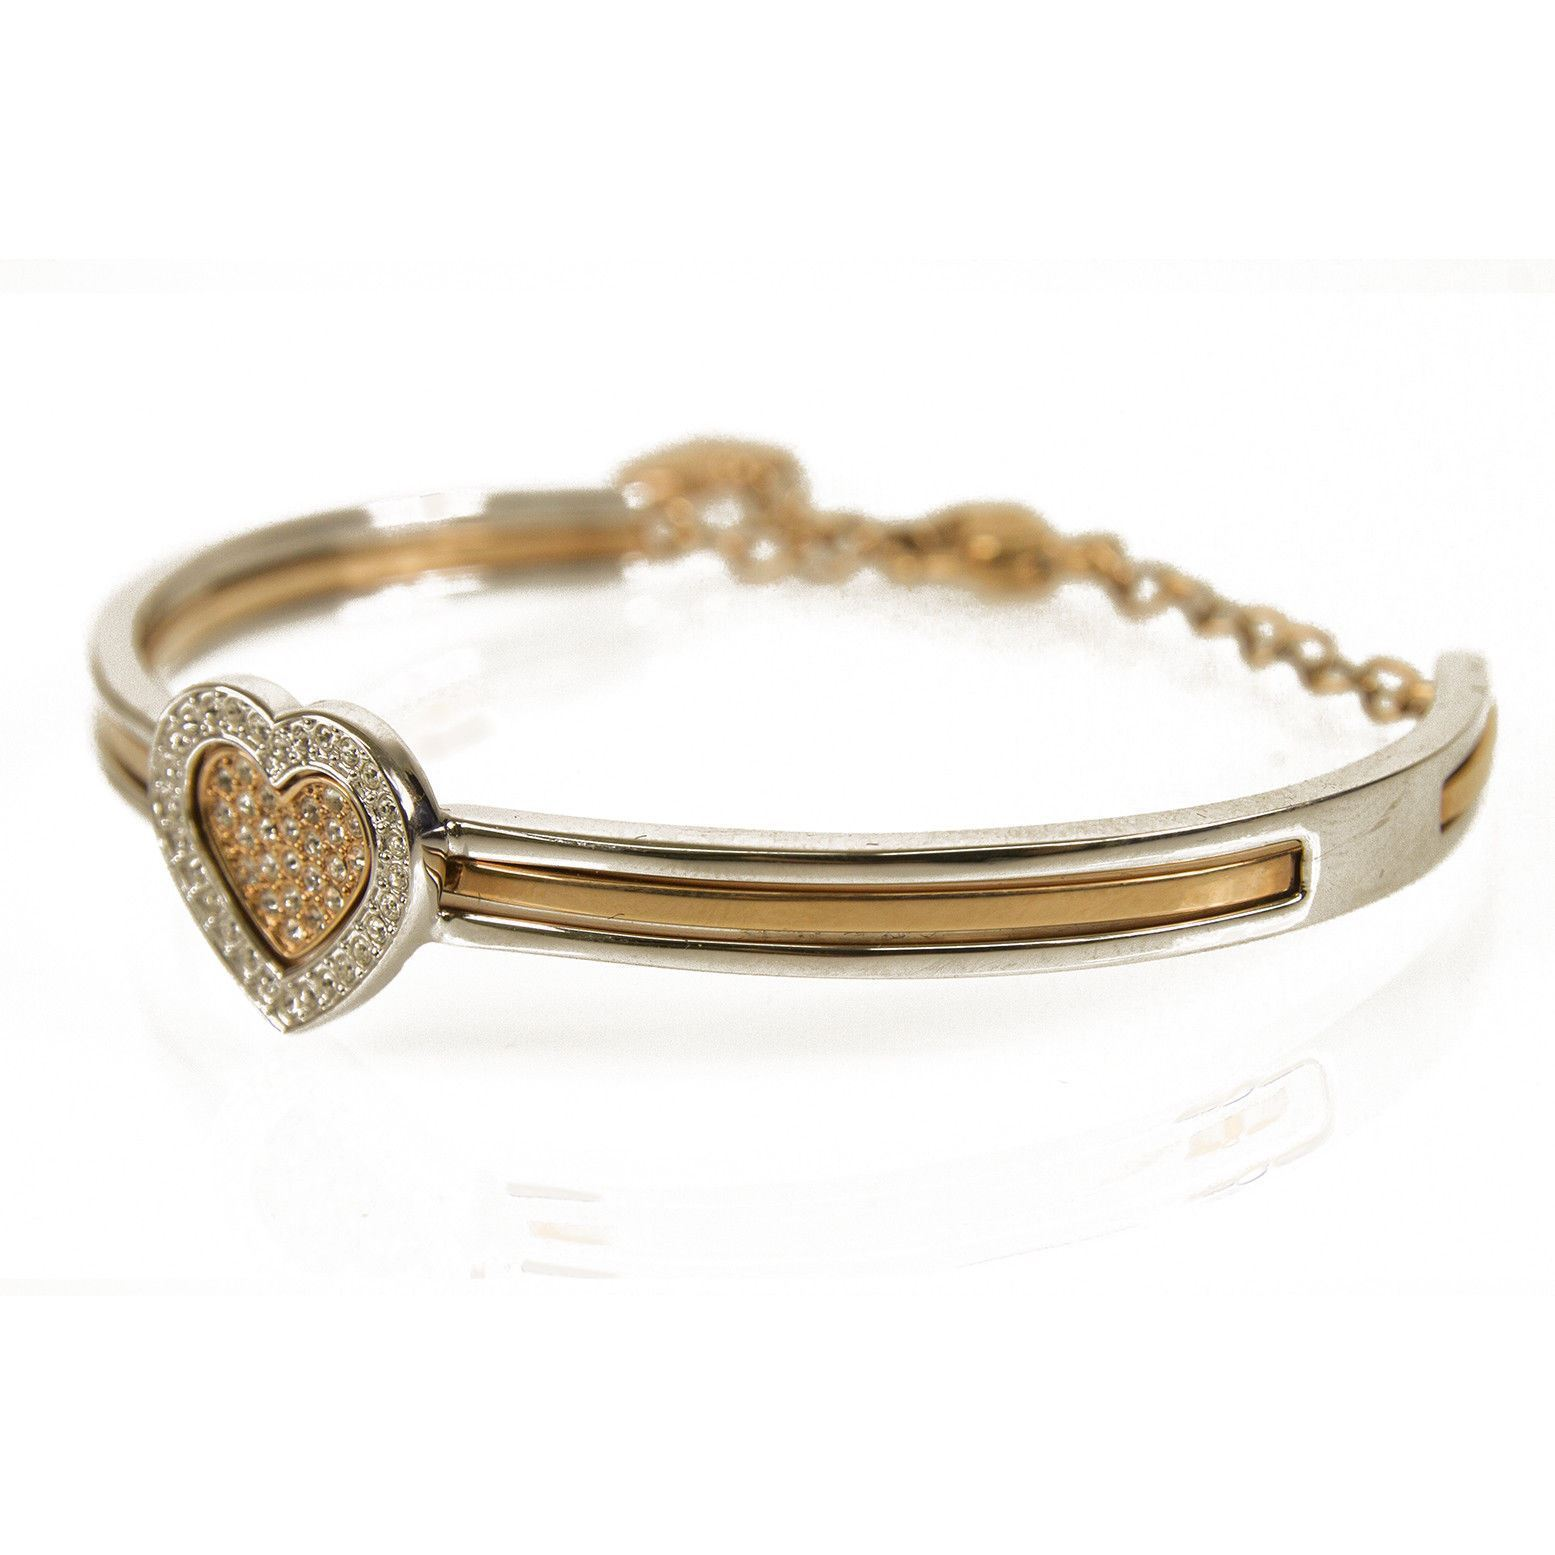 Swarovski J-Nina Cupid Heart Silver Gold Tone Crystals Oval Bangle Bracelet